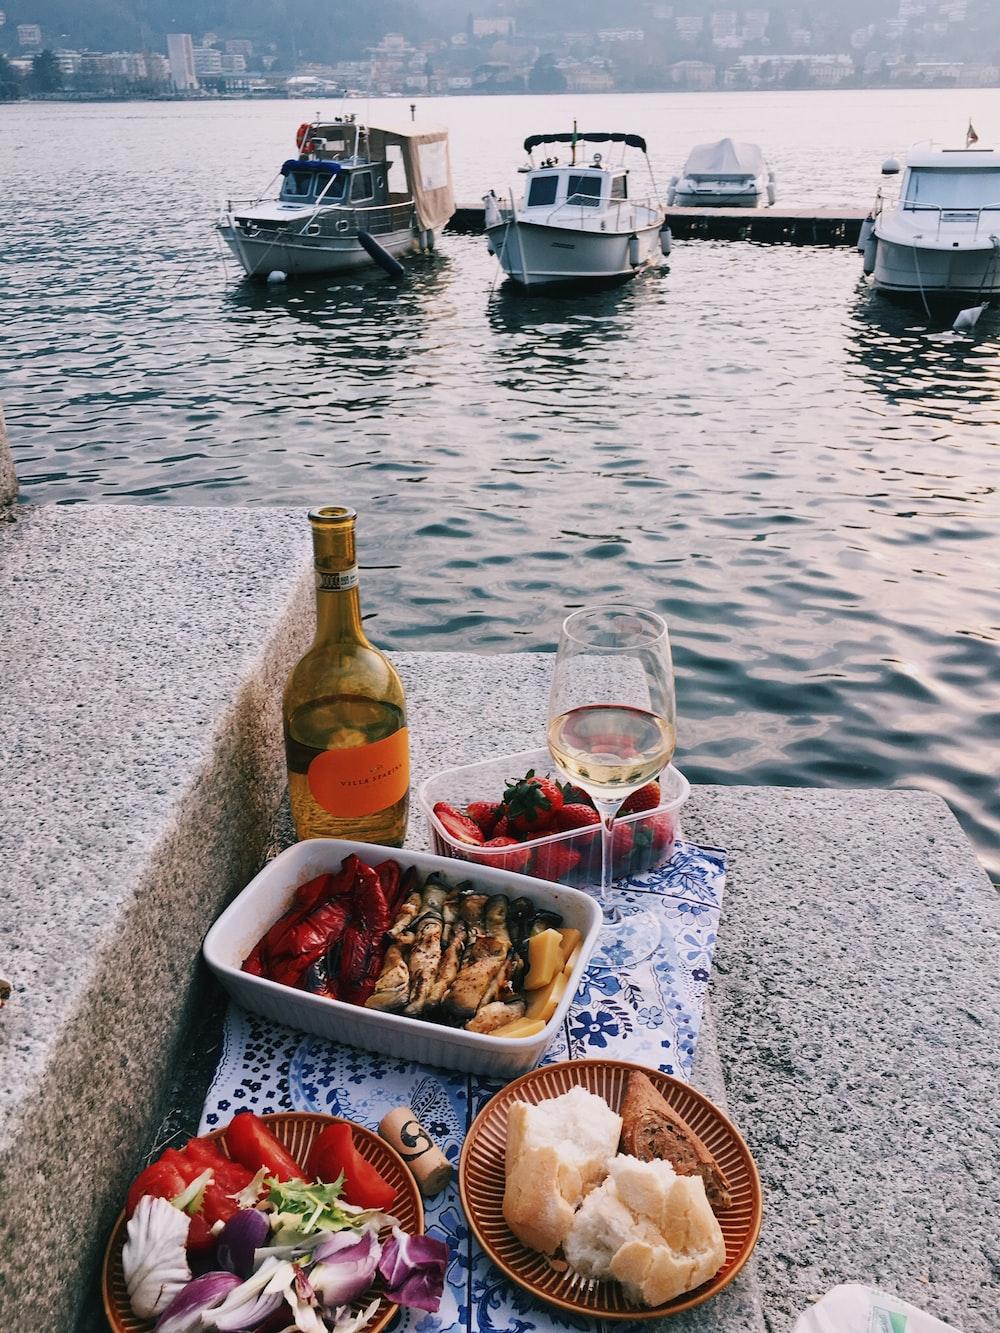 glass of wine and vegetaler